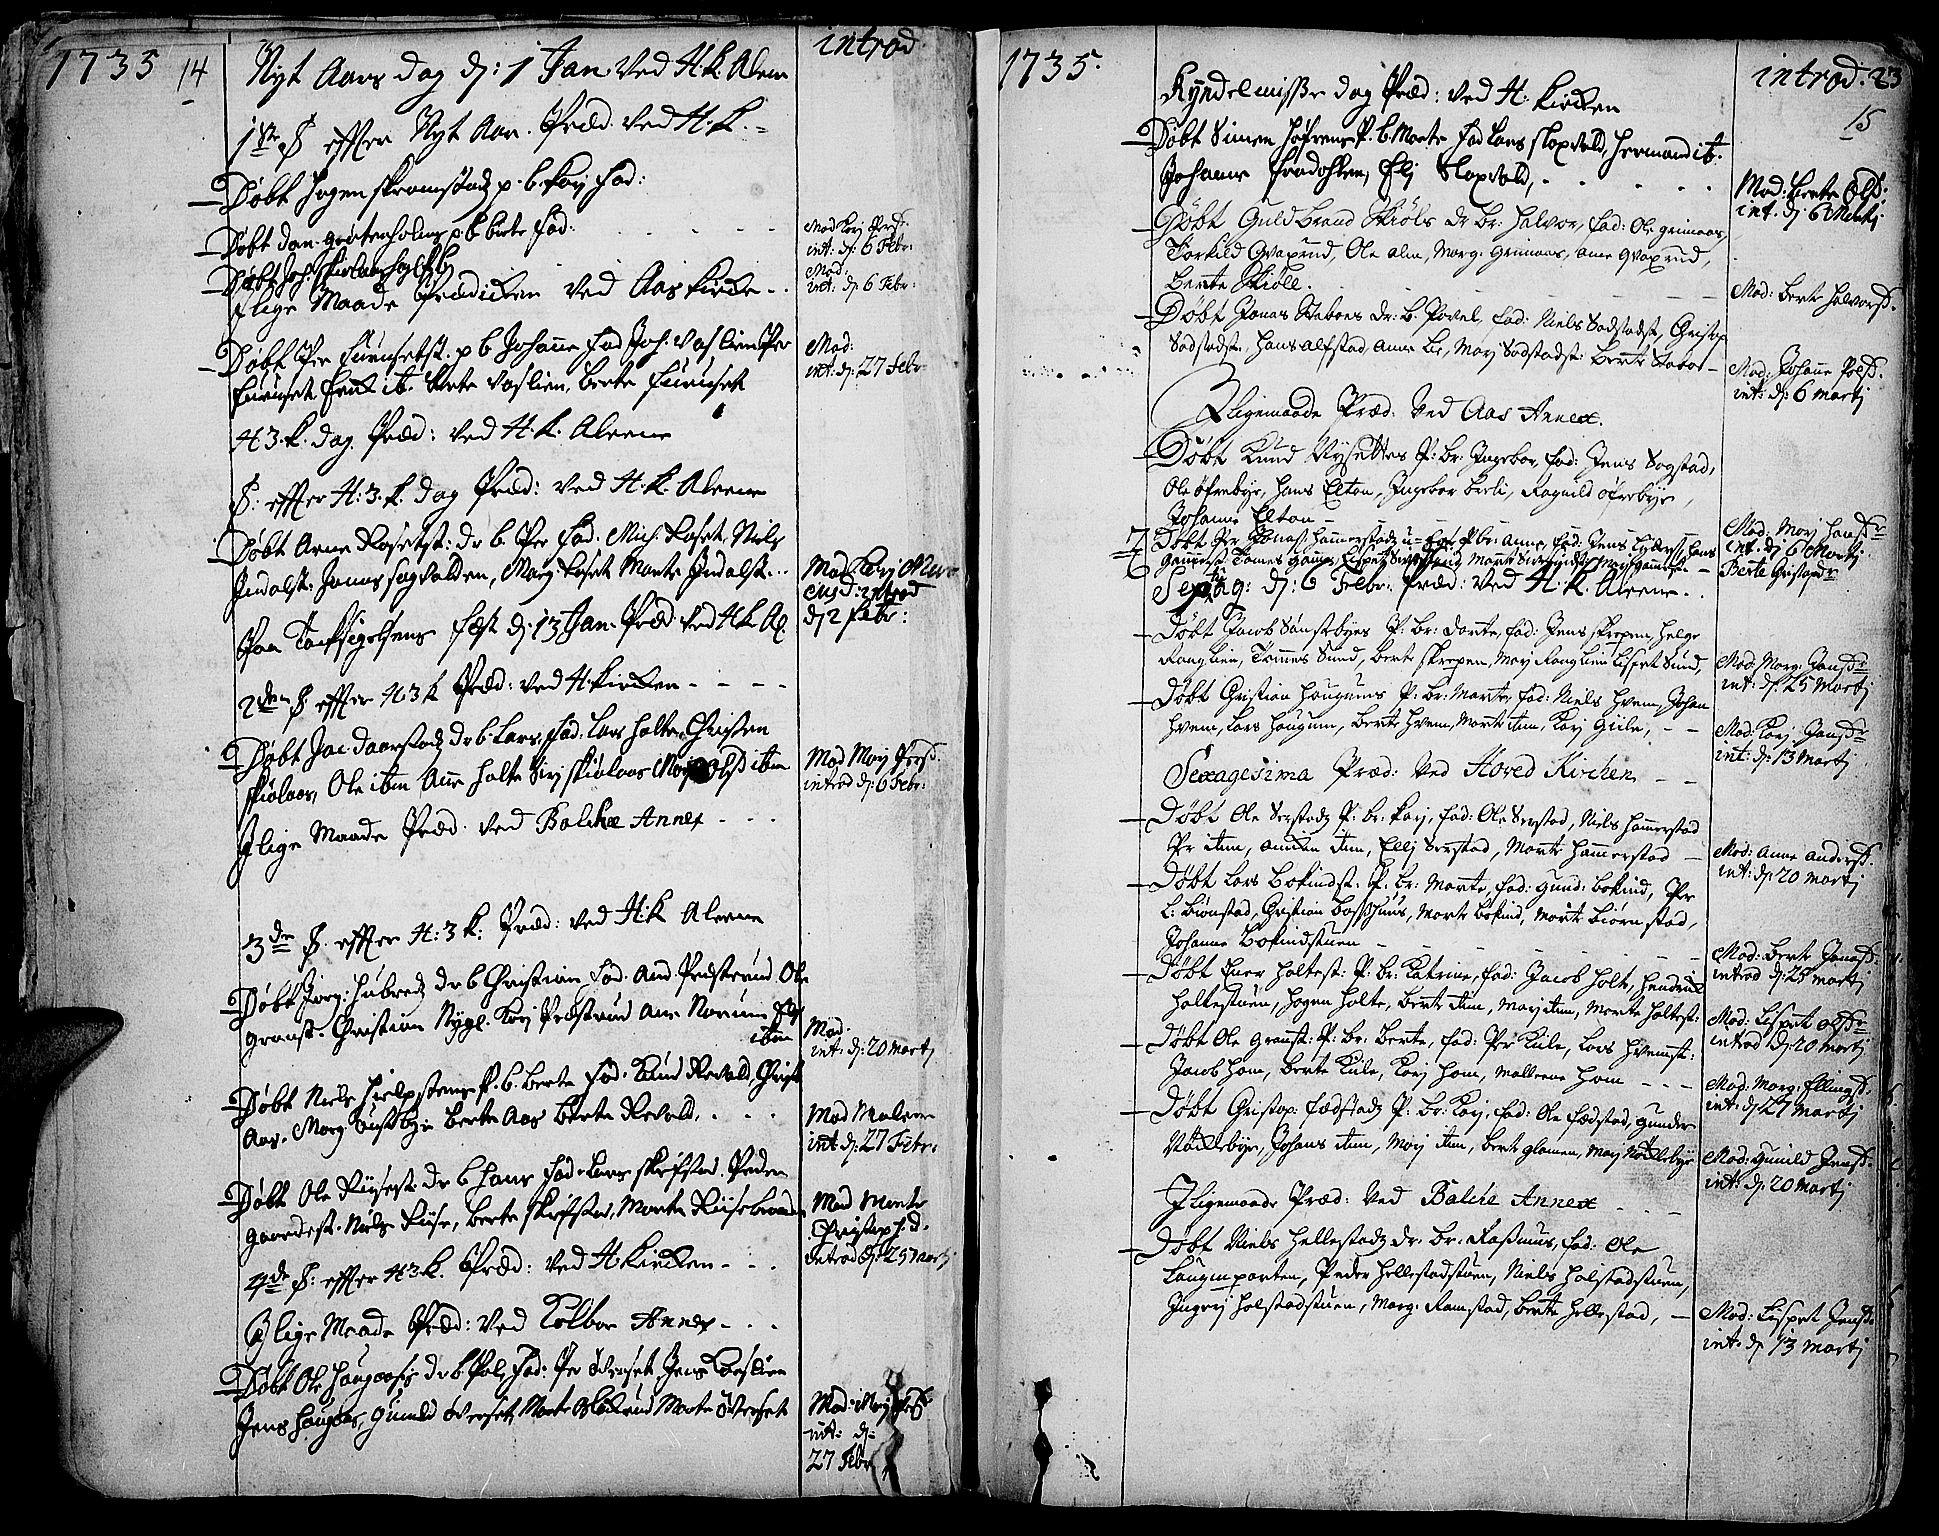 SAH, Toten prestekontor, Ministerialbok nr. 3, 1734-1751, s. 14-15